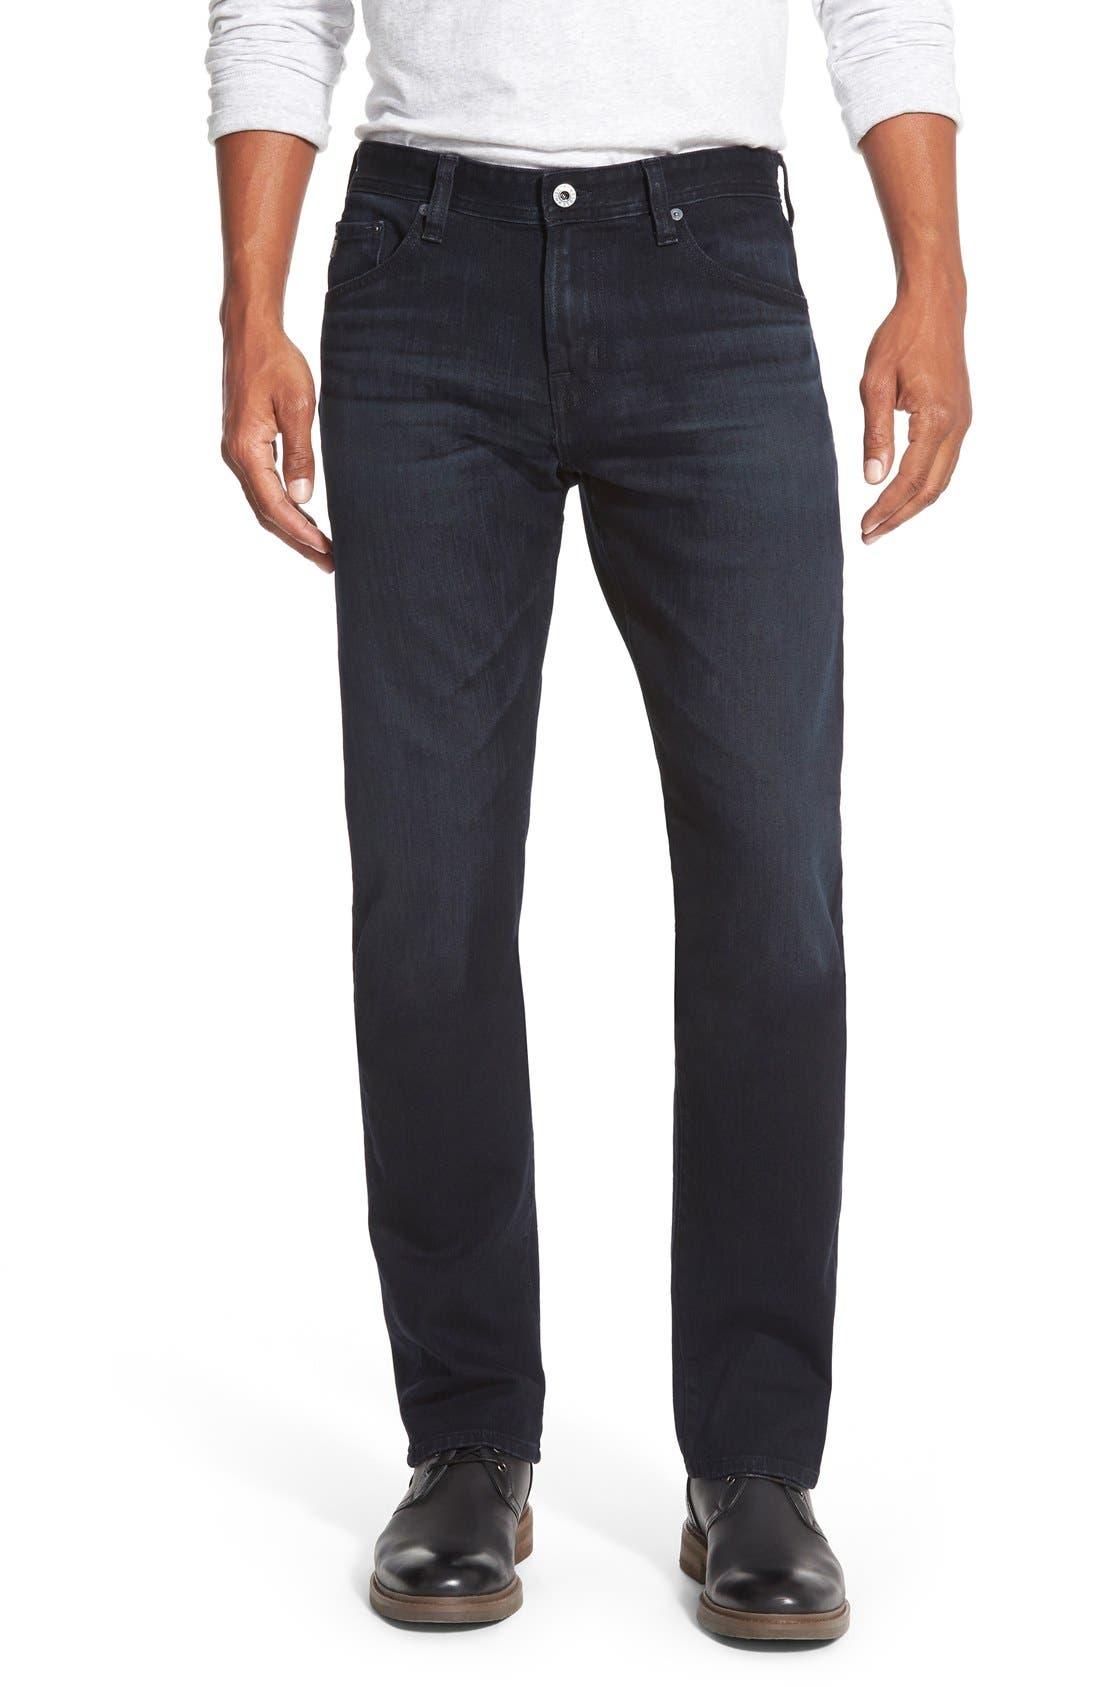 Graduate Slim Straight Leg Jeans,                             Main thumbnail 1, color,                             BUNDLED